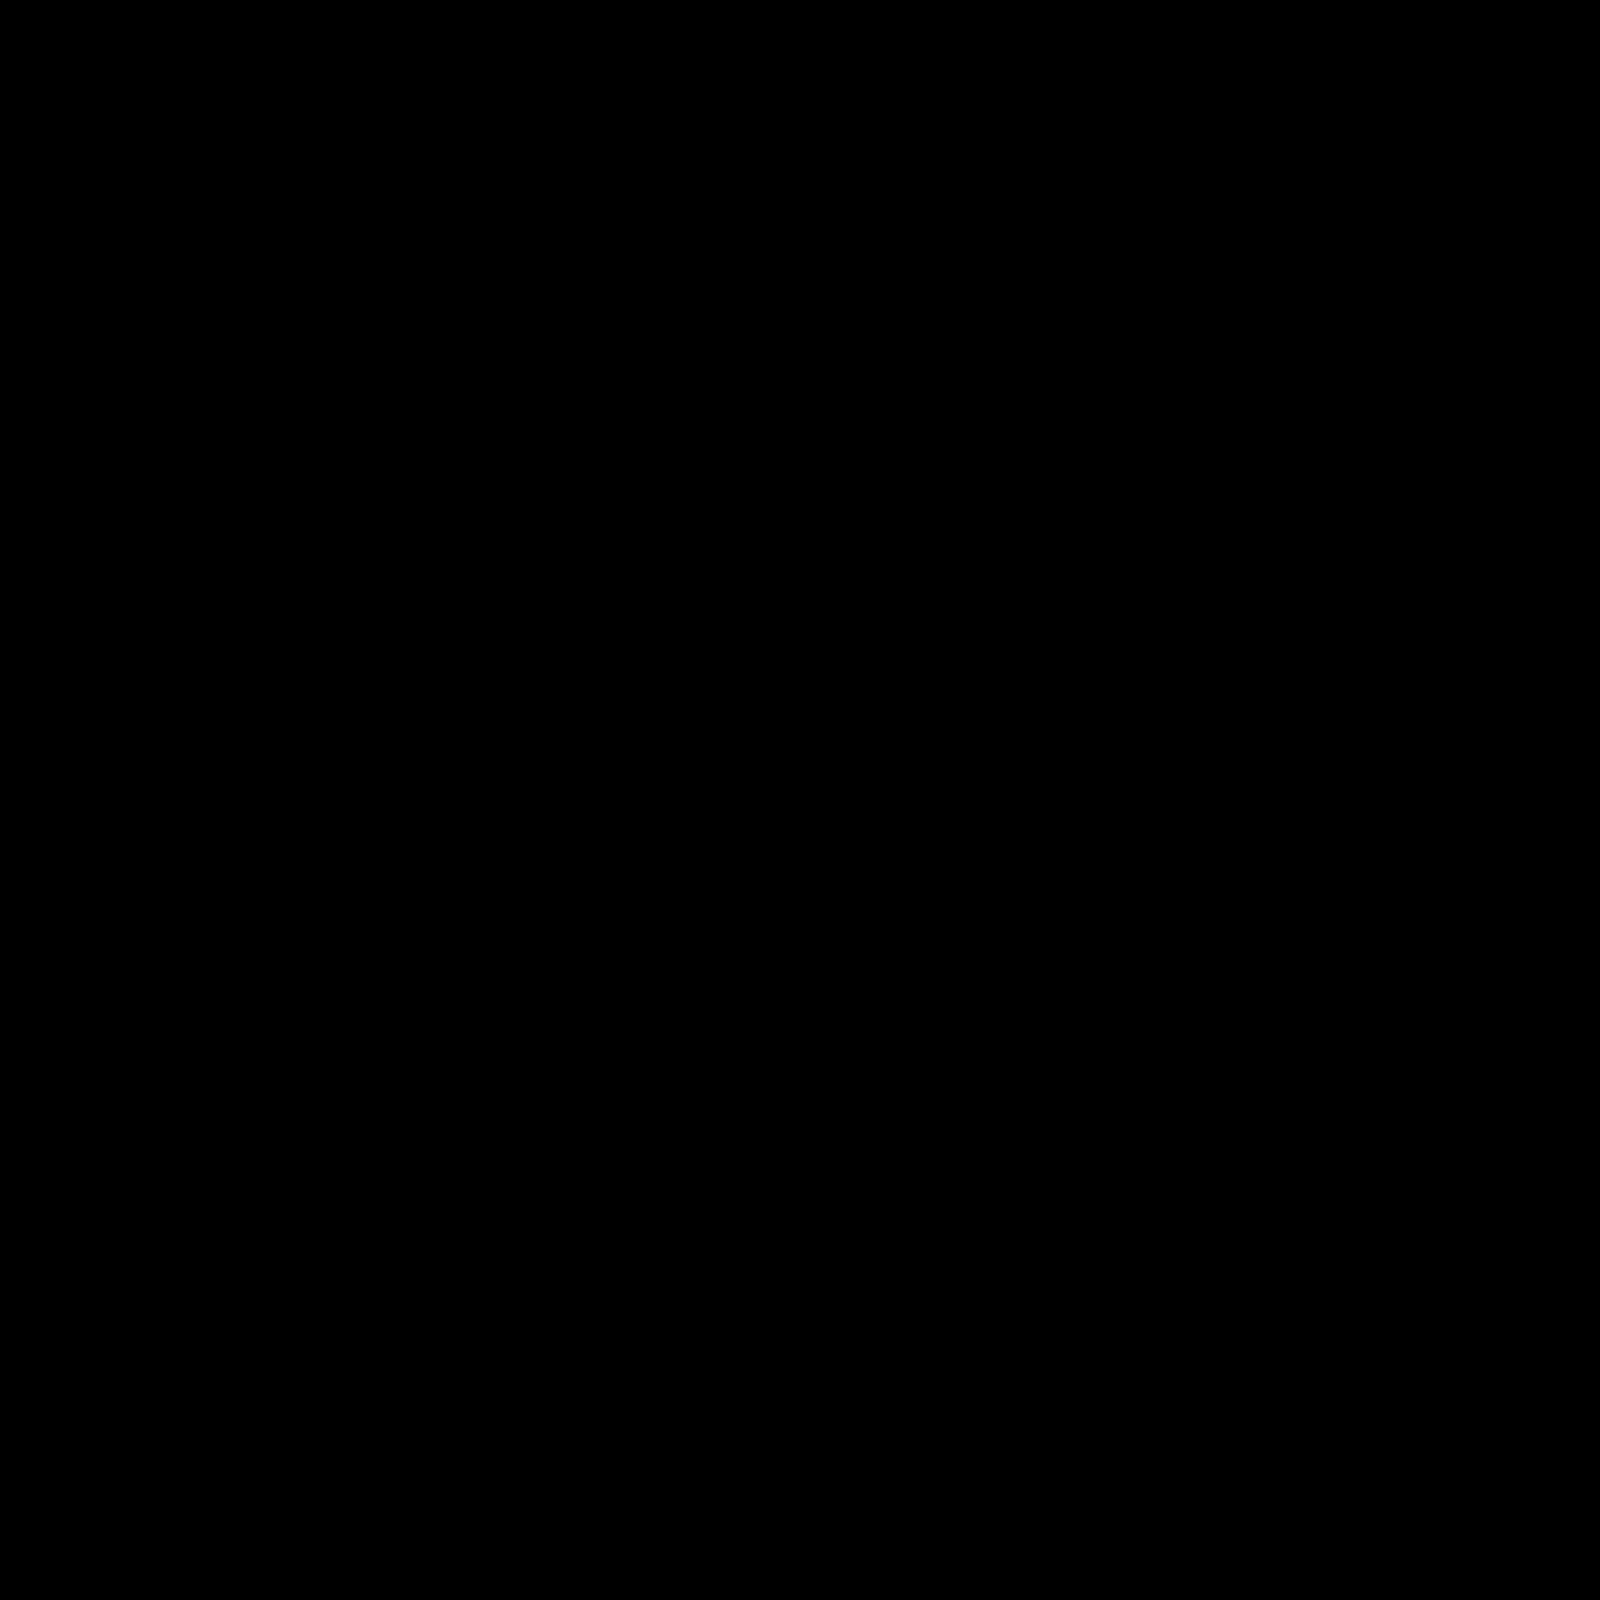 Drop Down icon